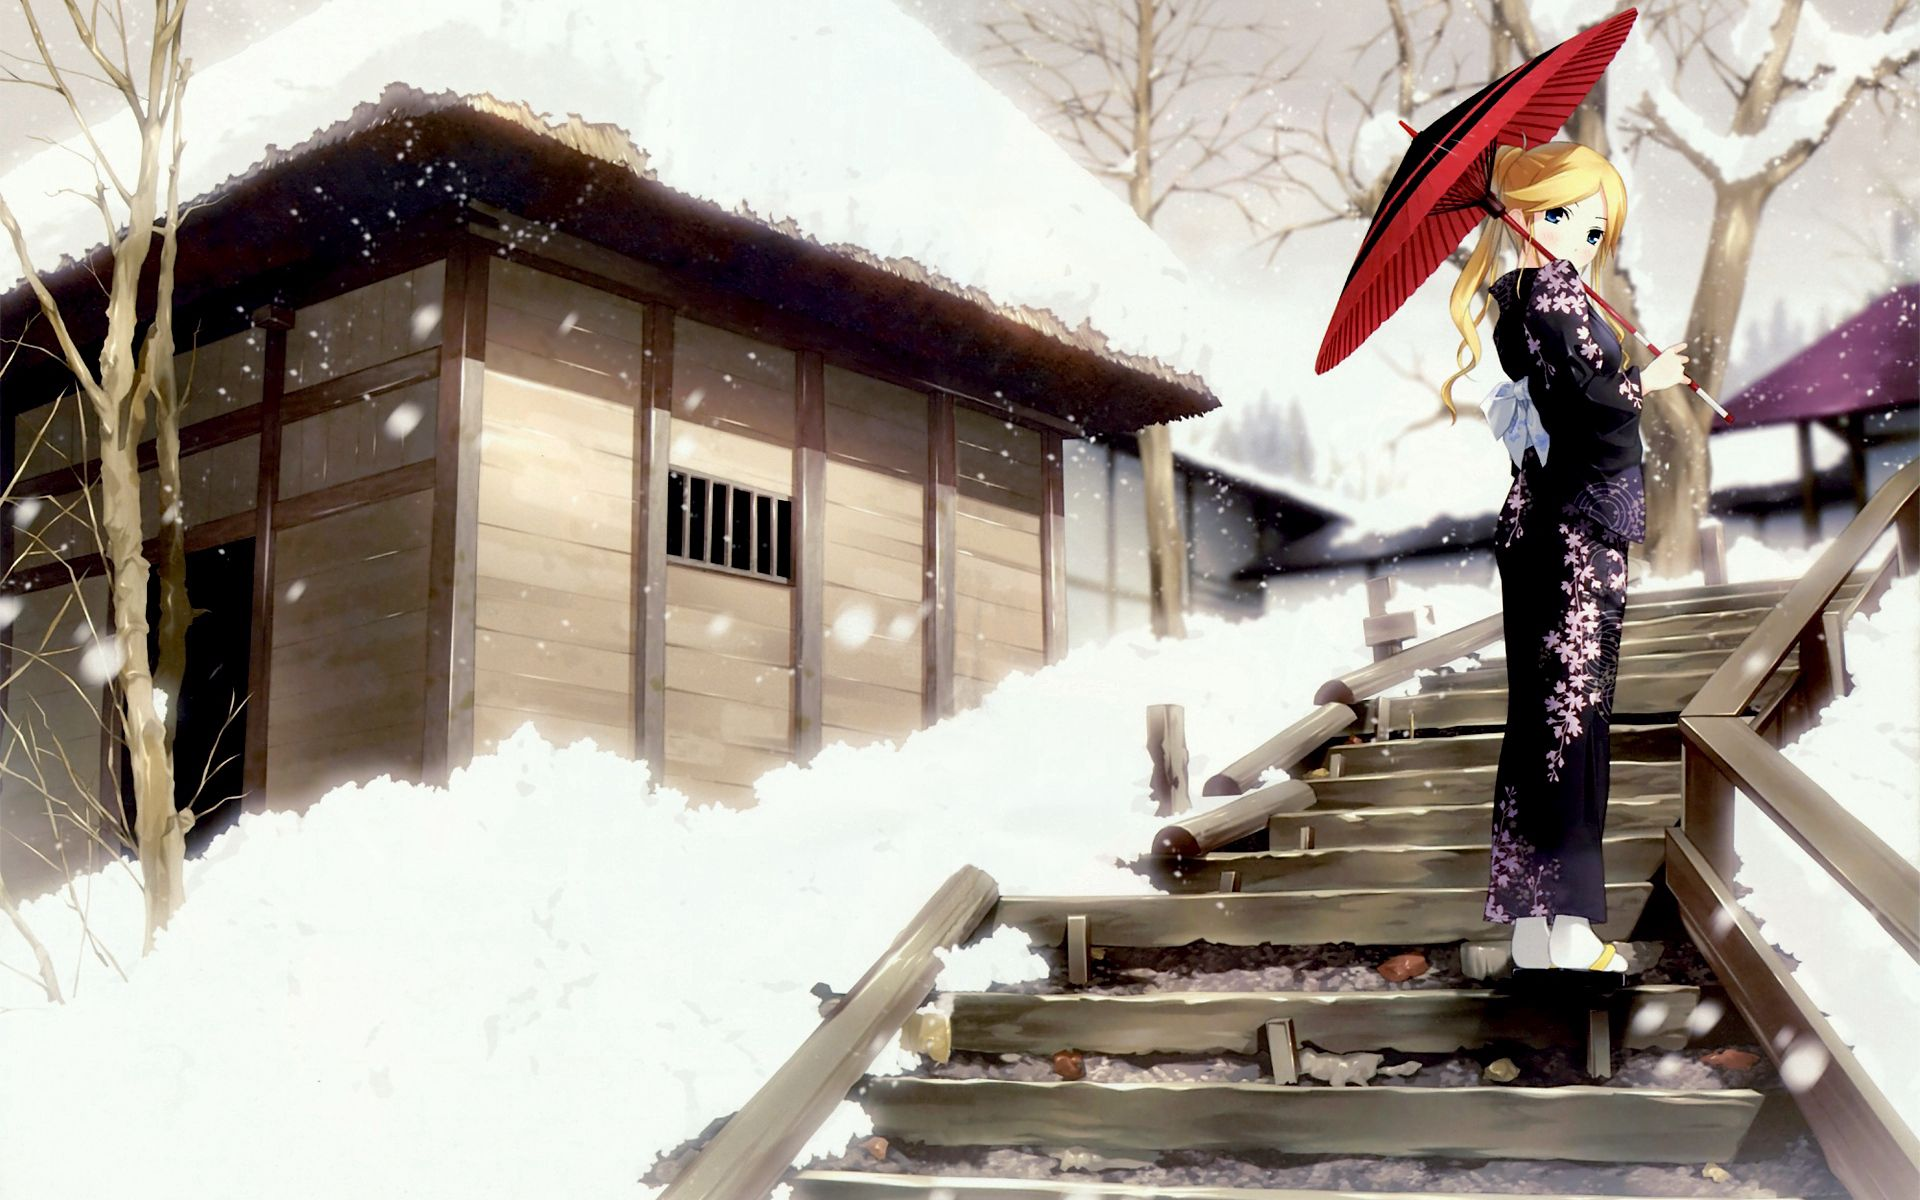 97261 download wallpaper Anime, Animeshka, Geisha, Kimono, Winter, Stroll screensavers and pictures for free